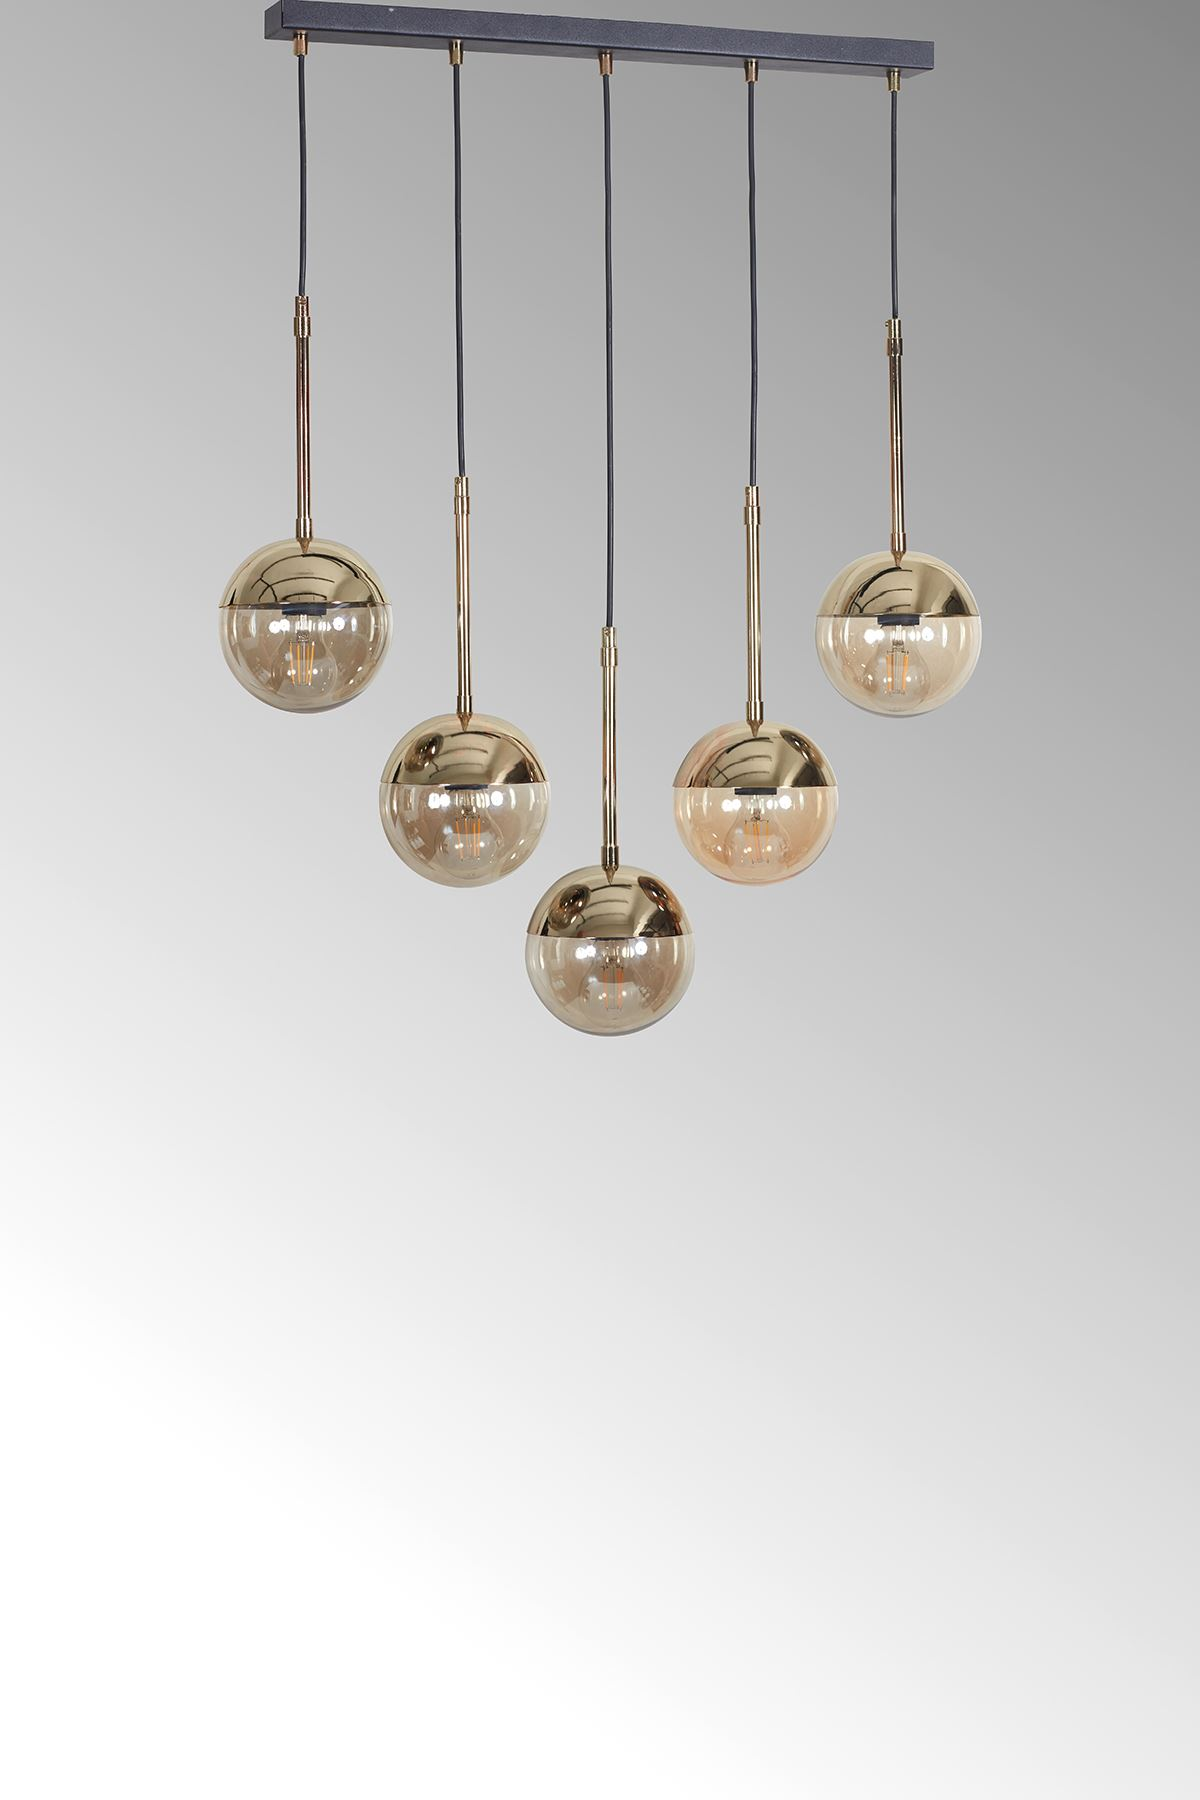 Roza 5 Li Gold-Siyah Metal Gövde Bal Rengi Camlı Tasarım Lüx Sarkıt Avize